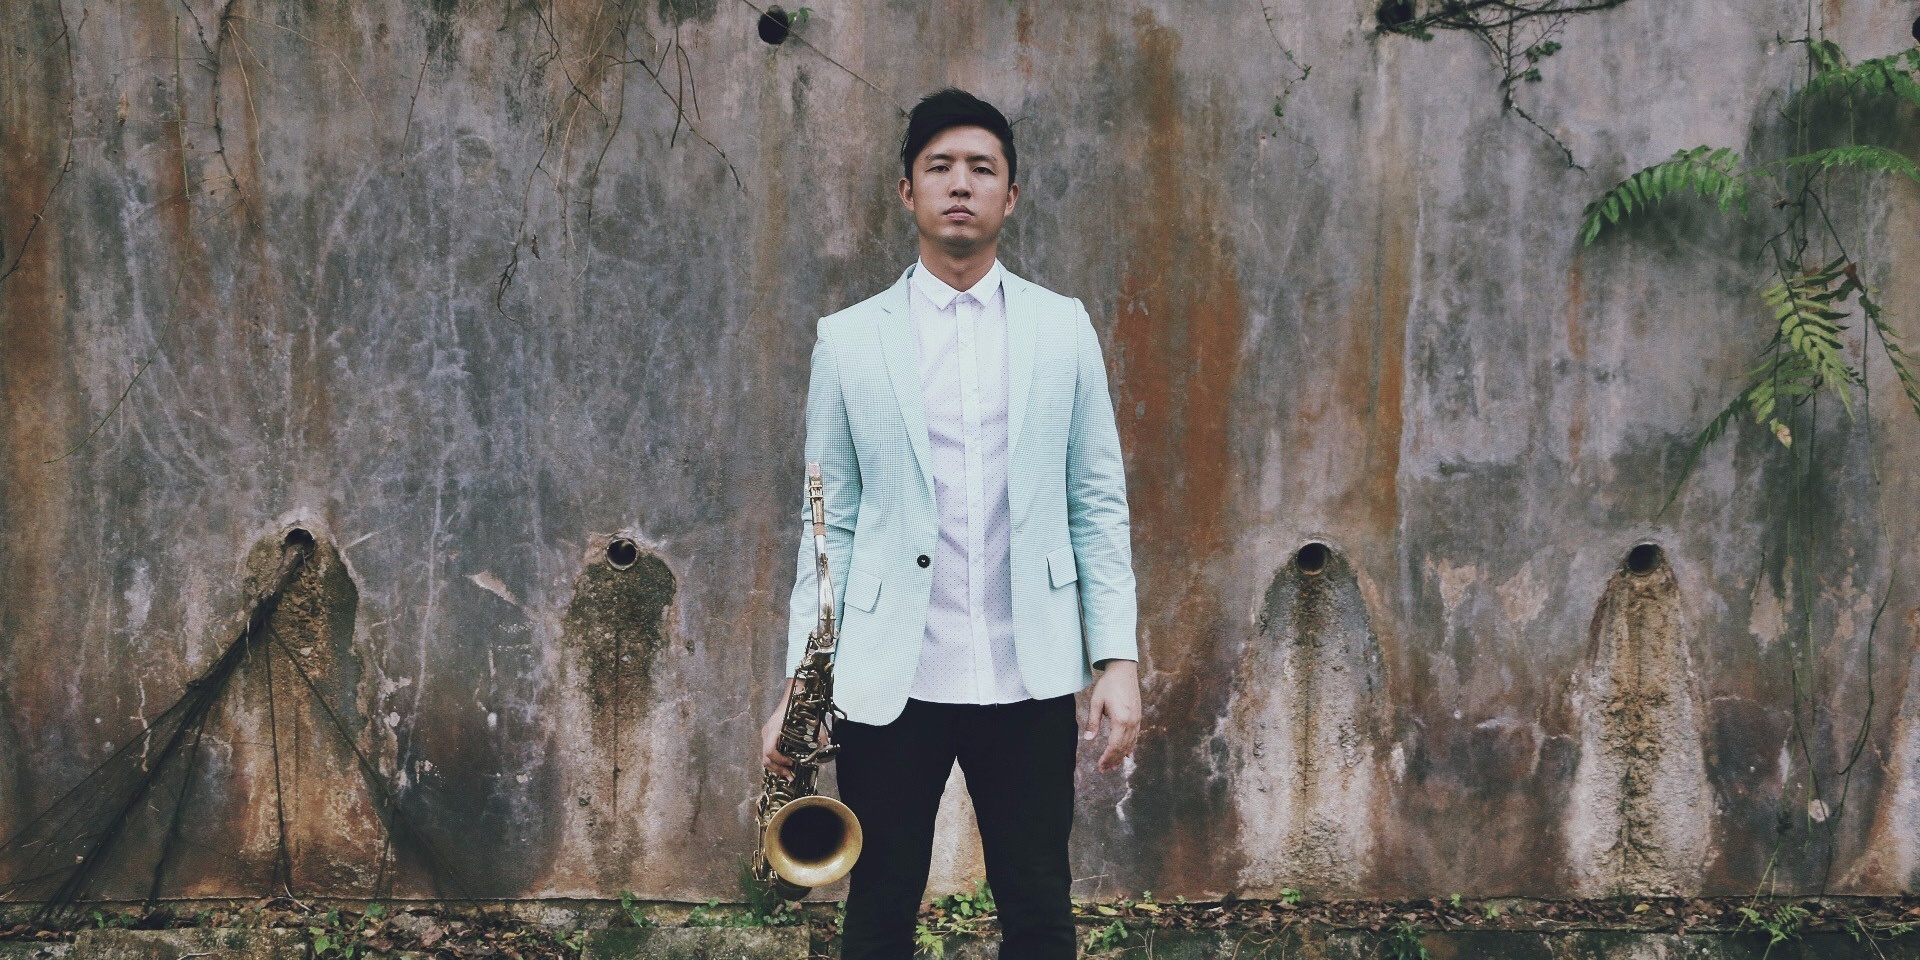 Singaporean jazz saxophonist Daniel Chia garners enormous support on Kickstarter for debut album